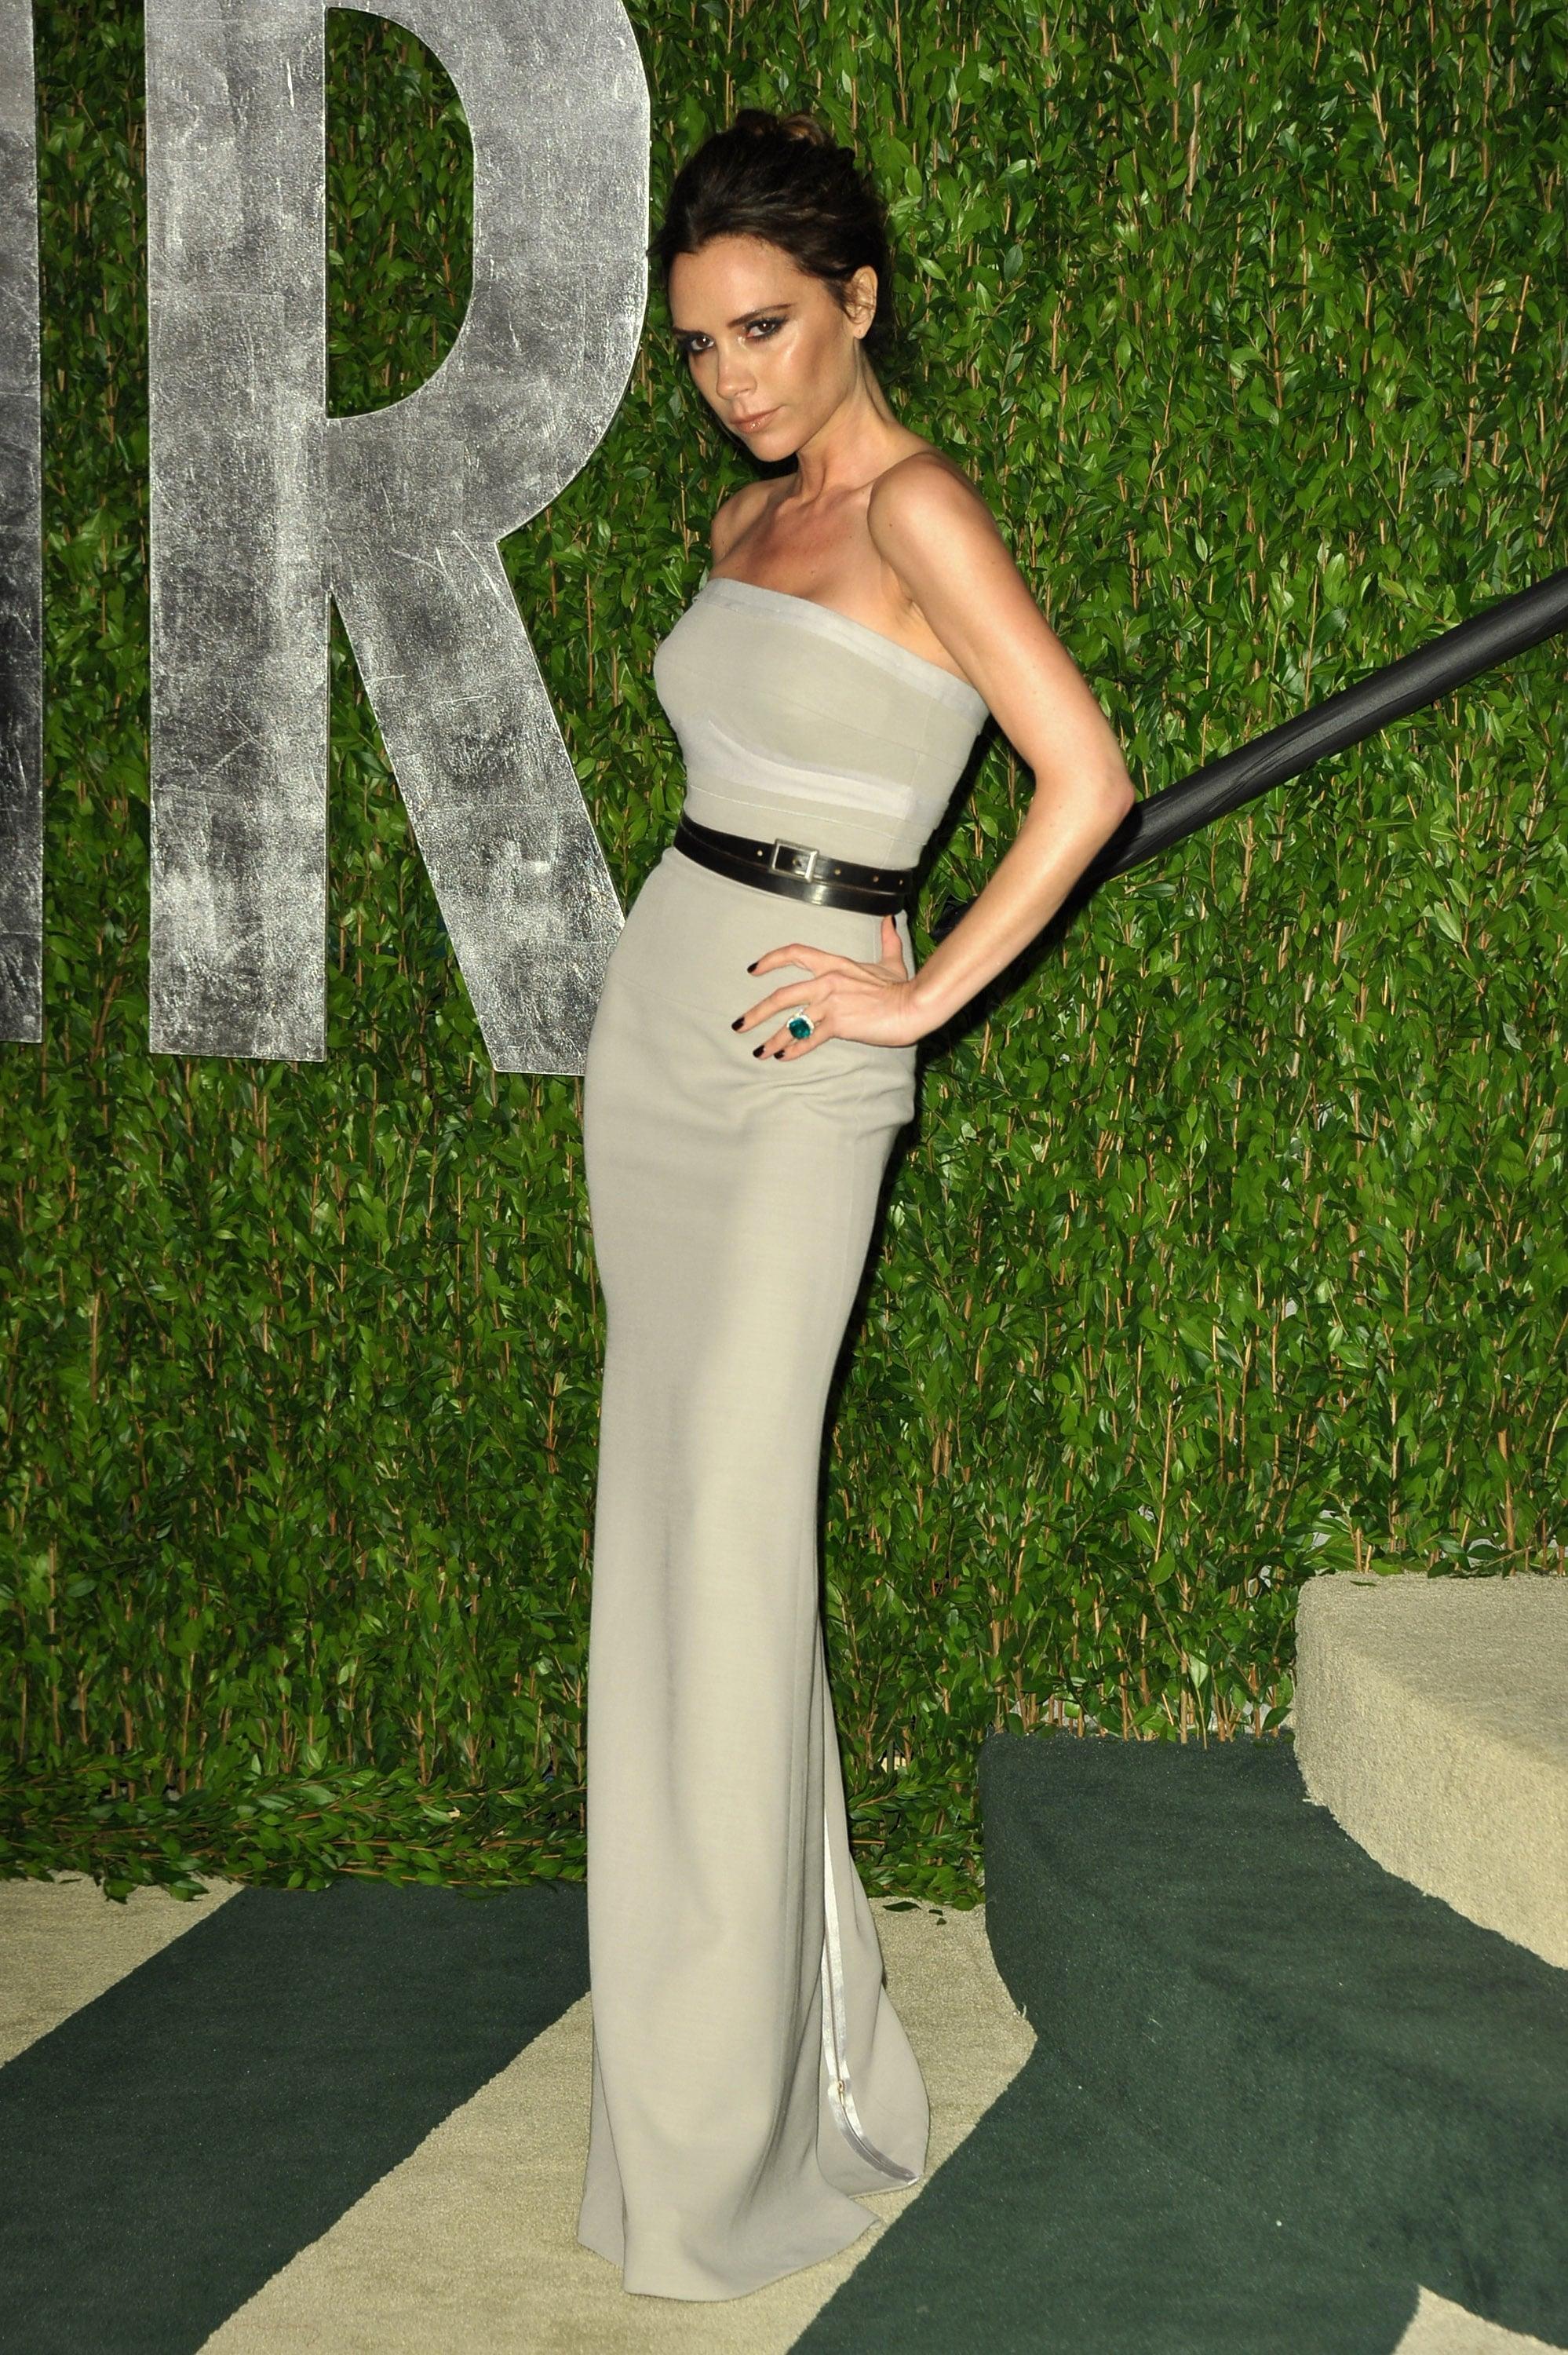 Victoria Beckham strikes a pose at the Vanity Fair Oscar party.